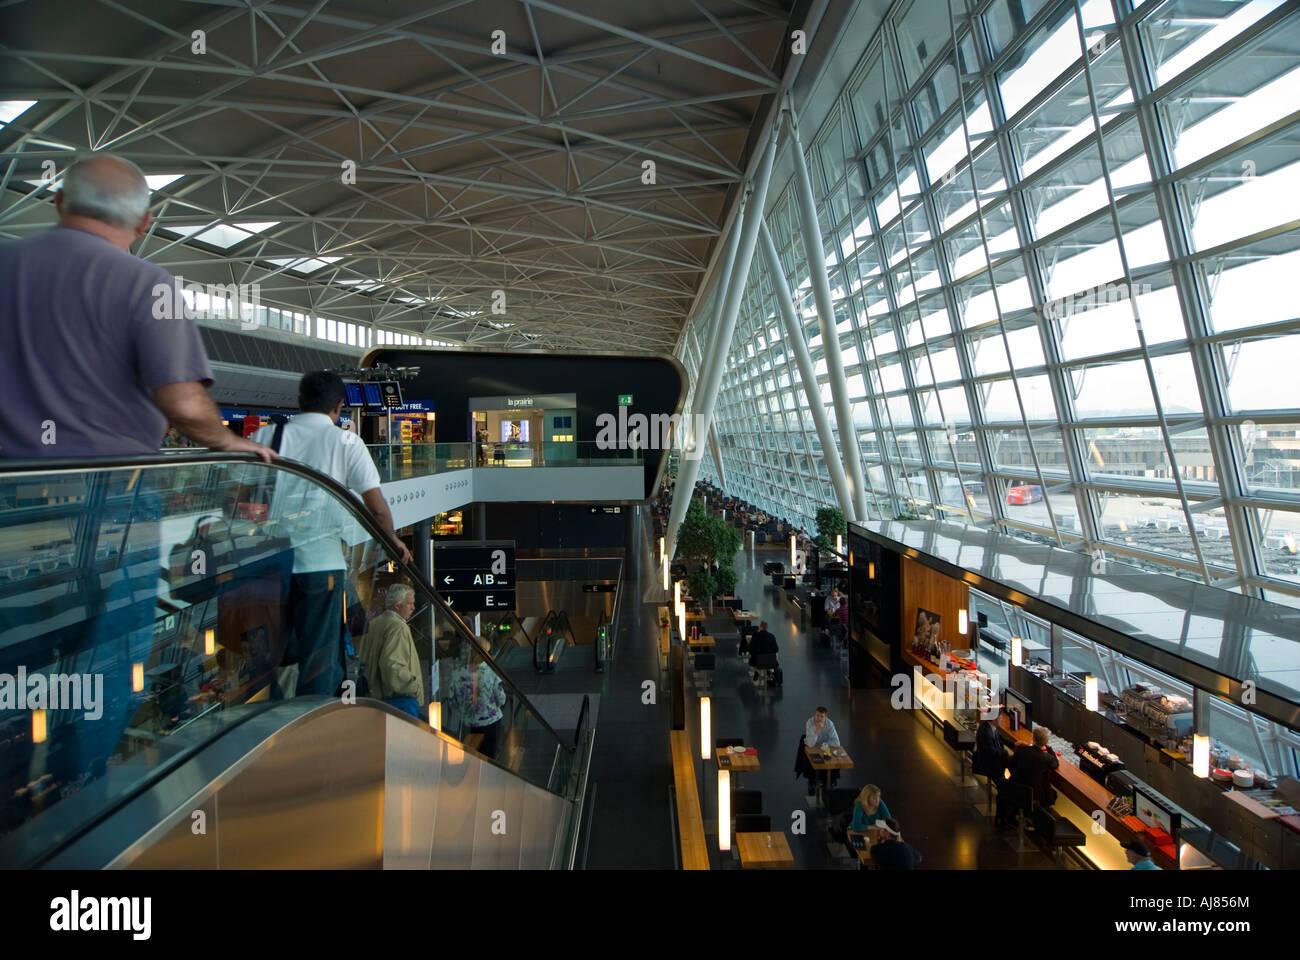 Airside Center, Fifth expansion, Zurich airport, Switzerland - Stock Image